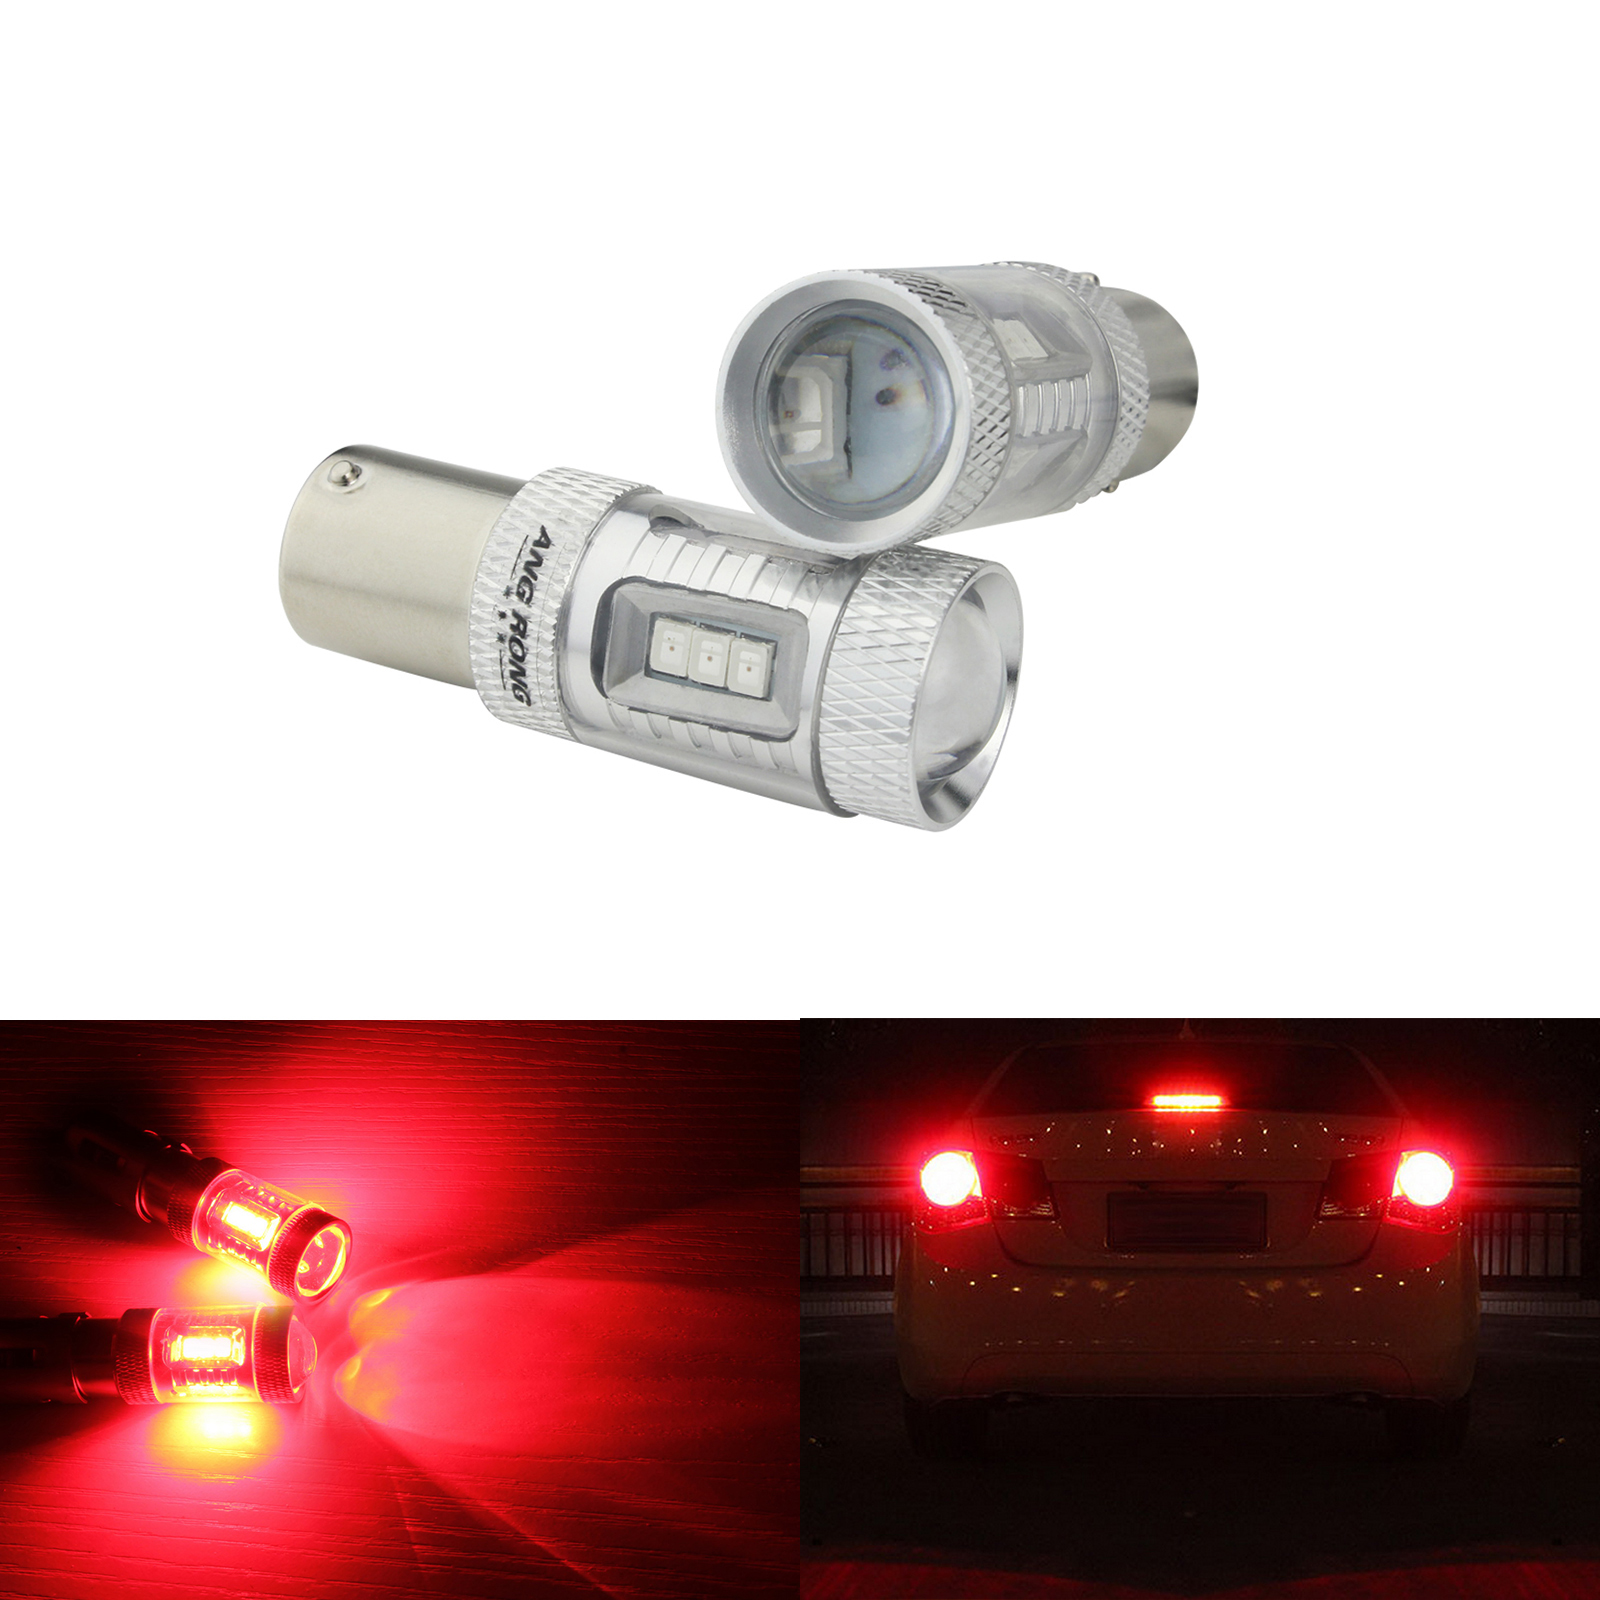 BULB 12V 10W BA15S ORANGE STOP TAIL BRAKE LIGHT LAMP REAR INDICATOR CAR AUTO EXTERIOR TURN SIGNAL MOTORCYCLE